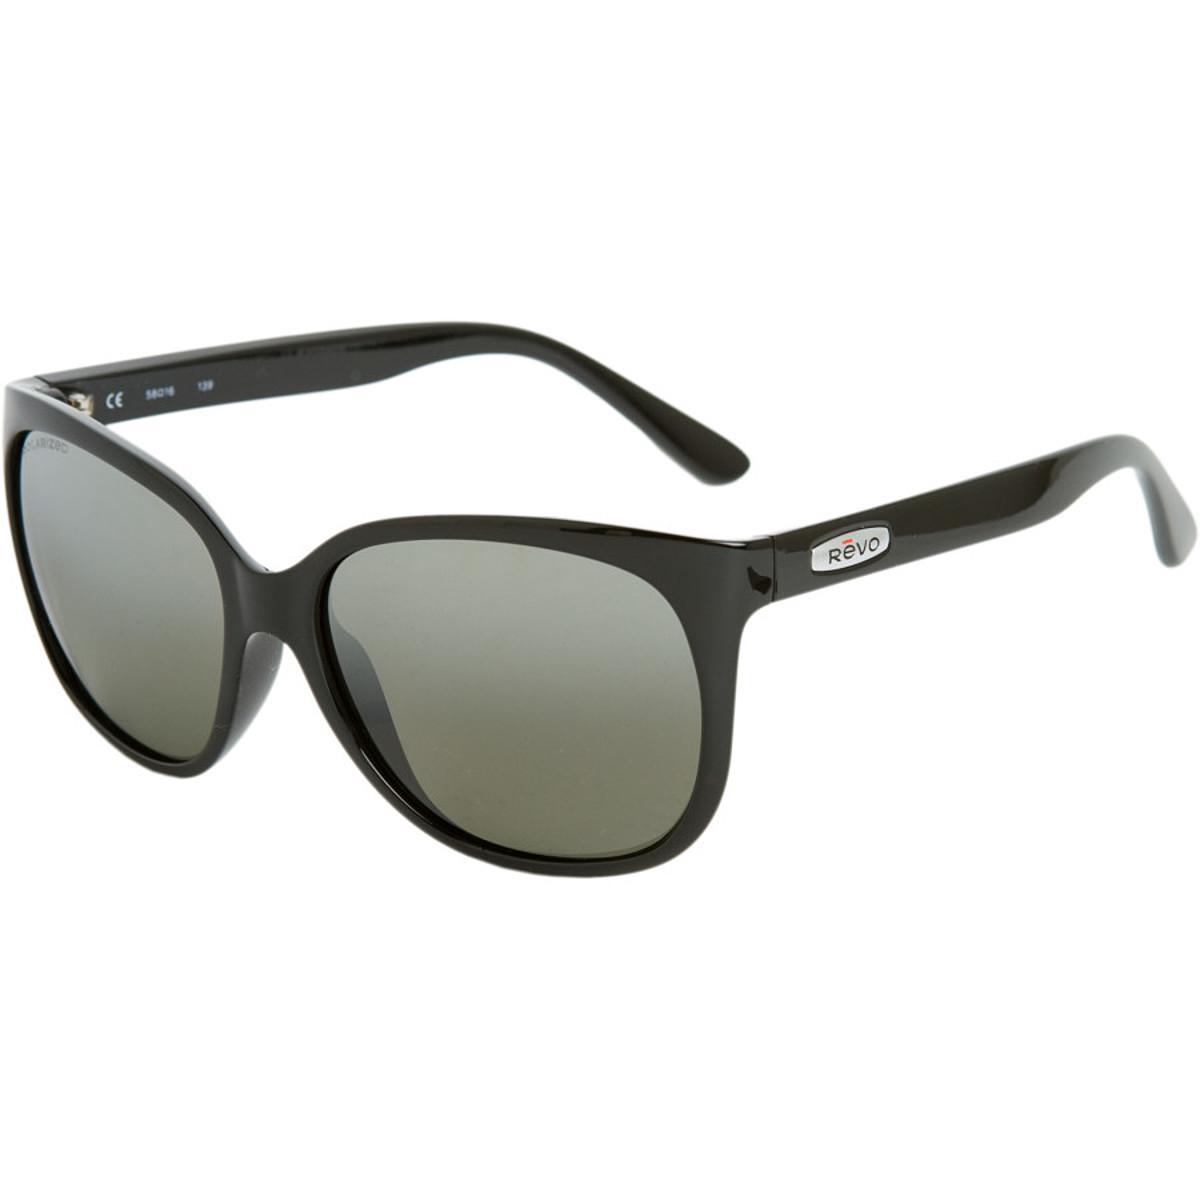 3631bd33bb Lyst - Revo Grand Classic Sunglasses - Polarized in Black